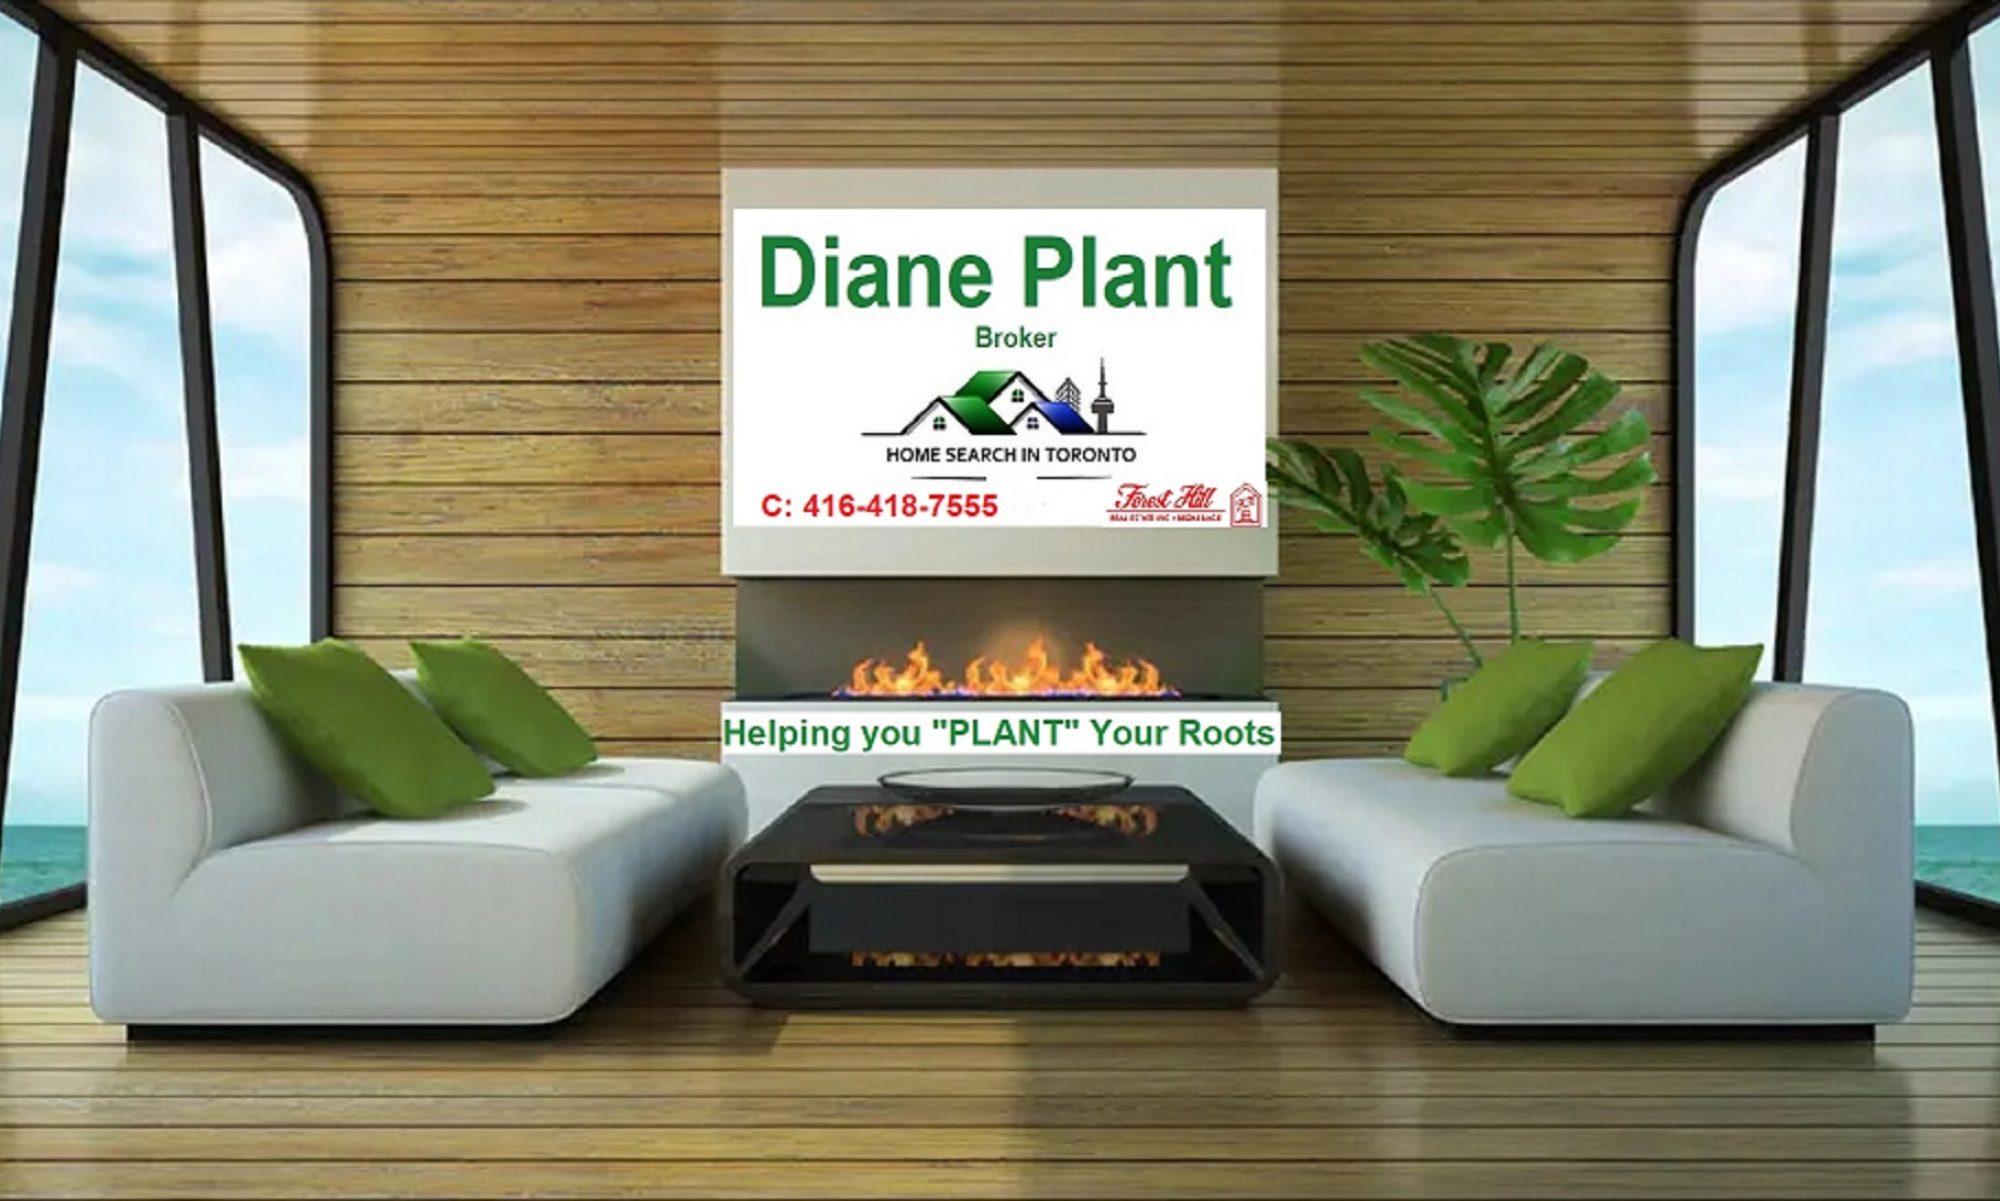 Diane Plant